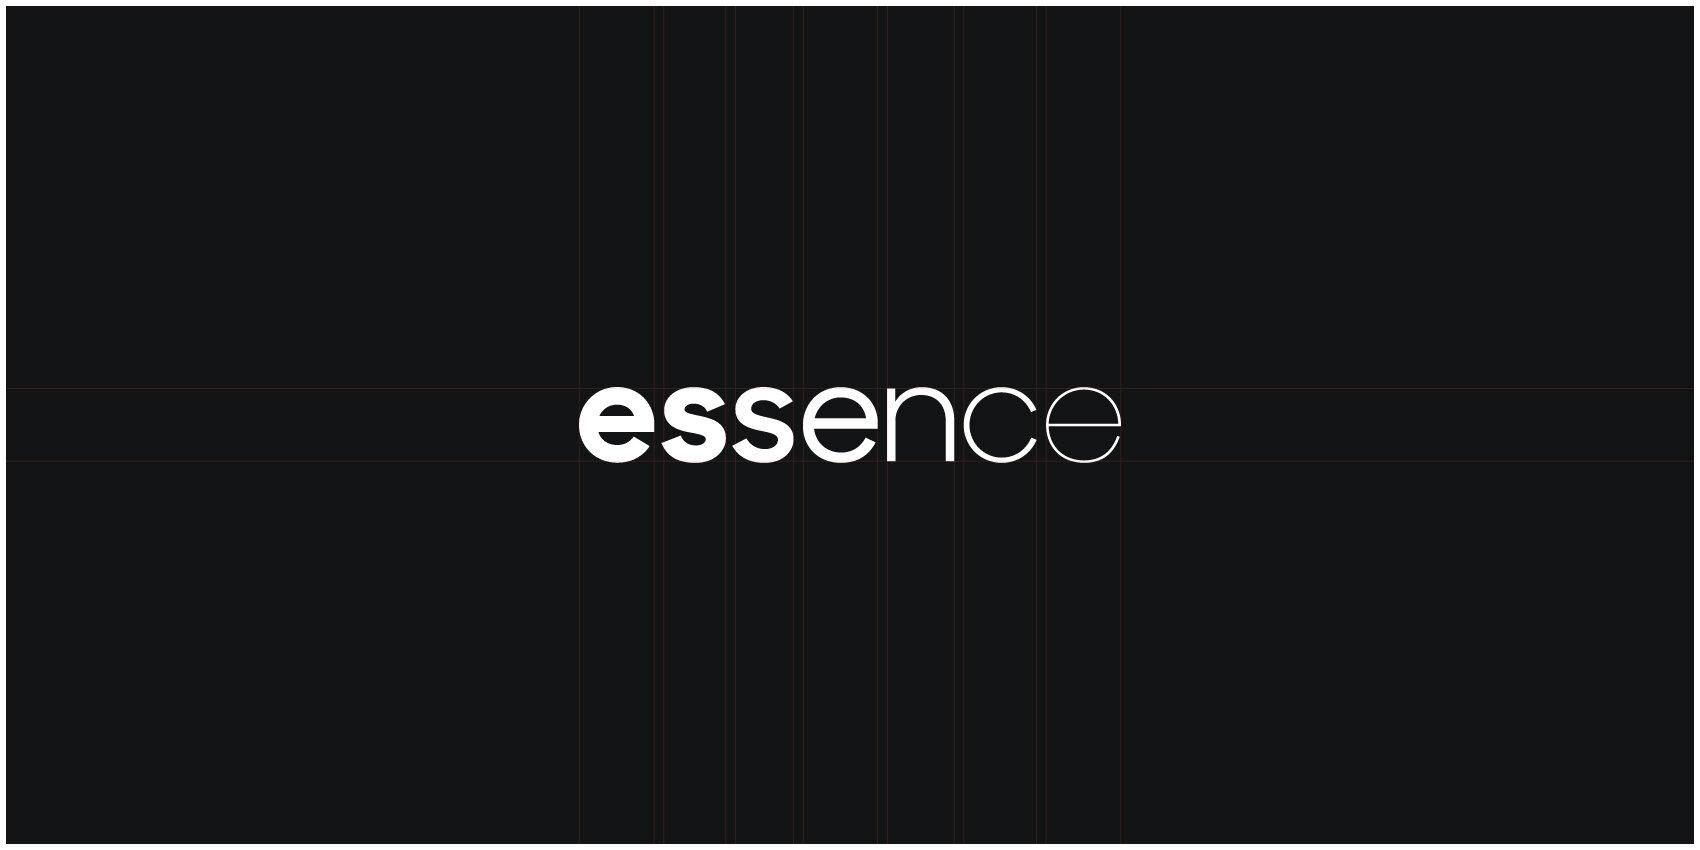 Essence-03.jpg